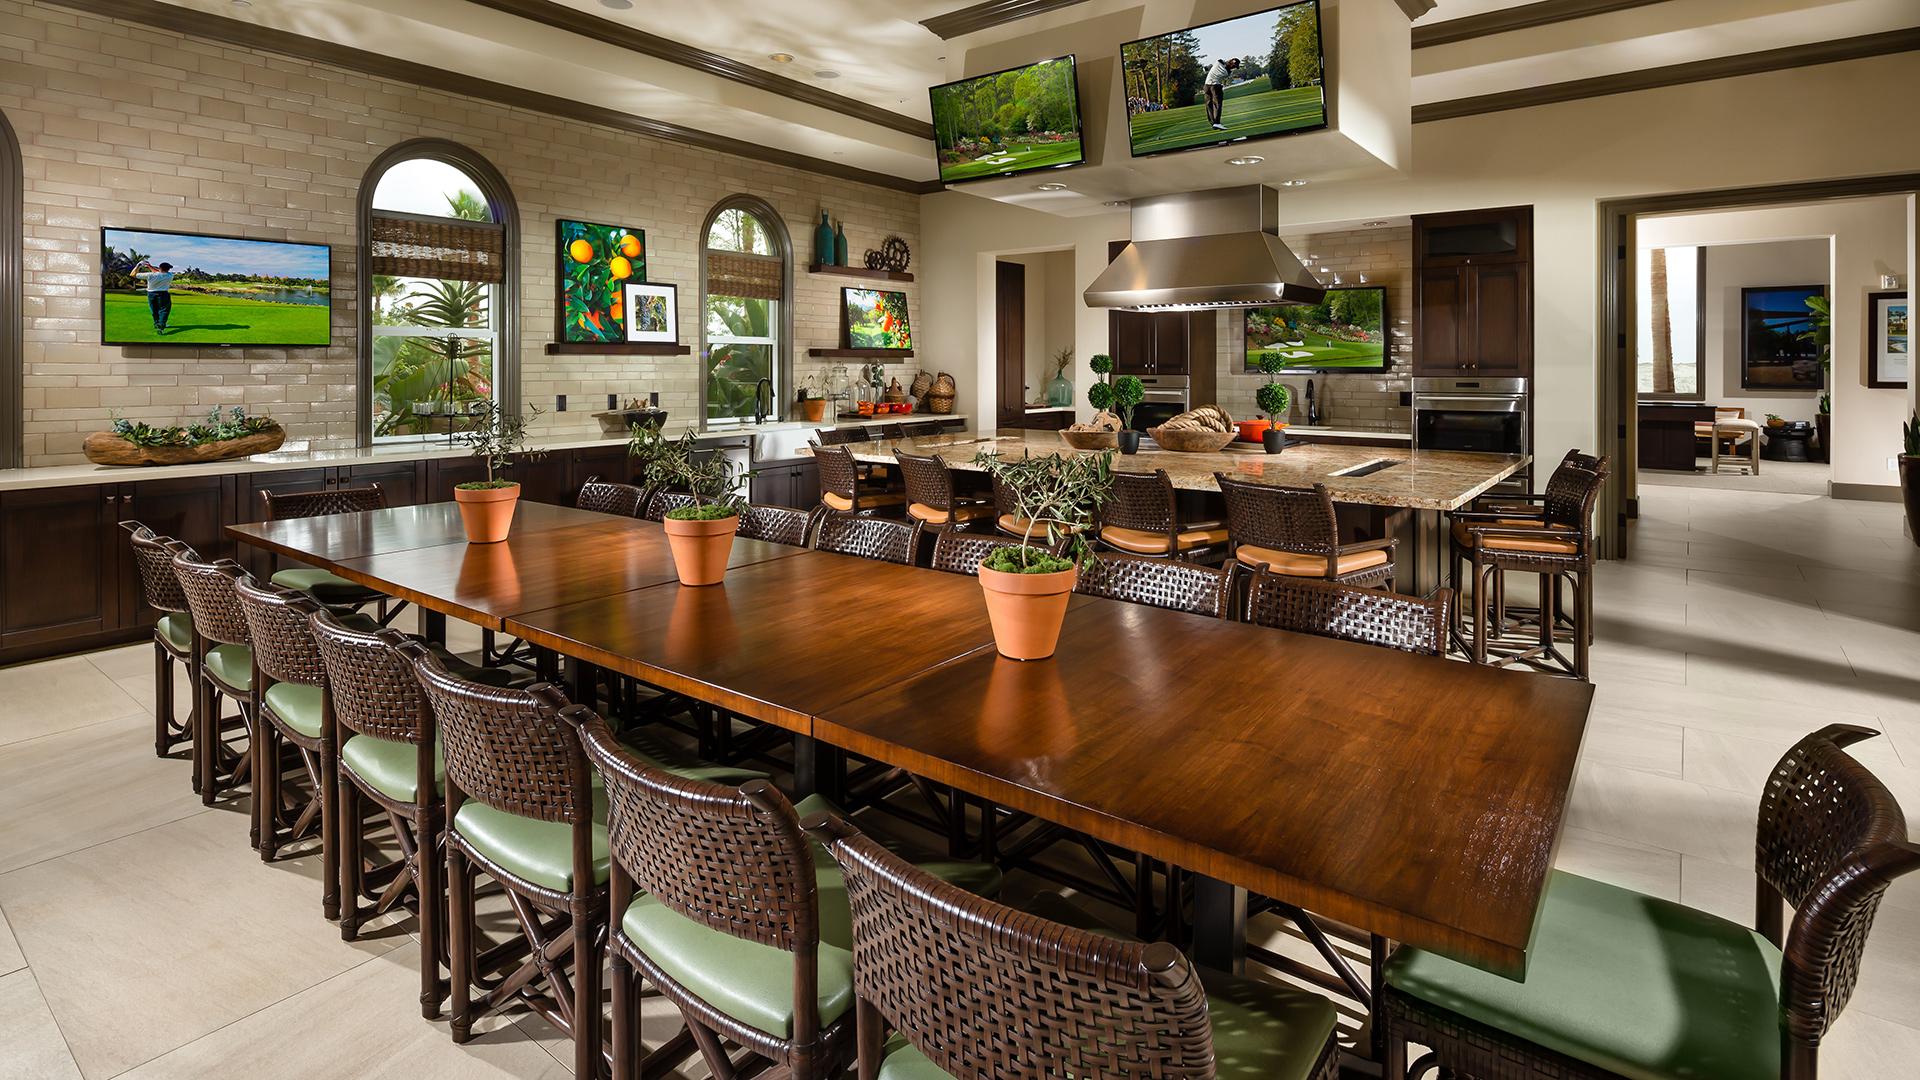 New Homes Garden Grove - Home Design Ideas